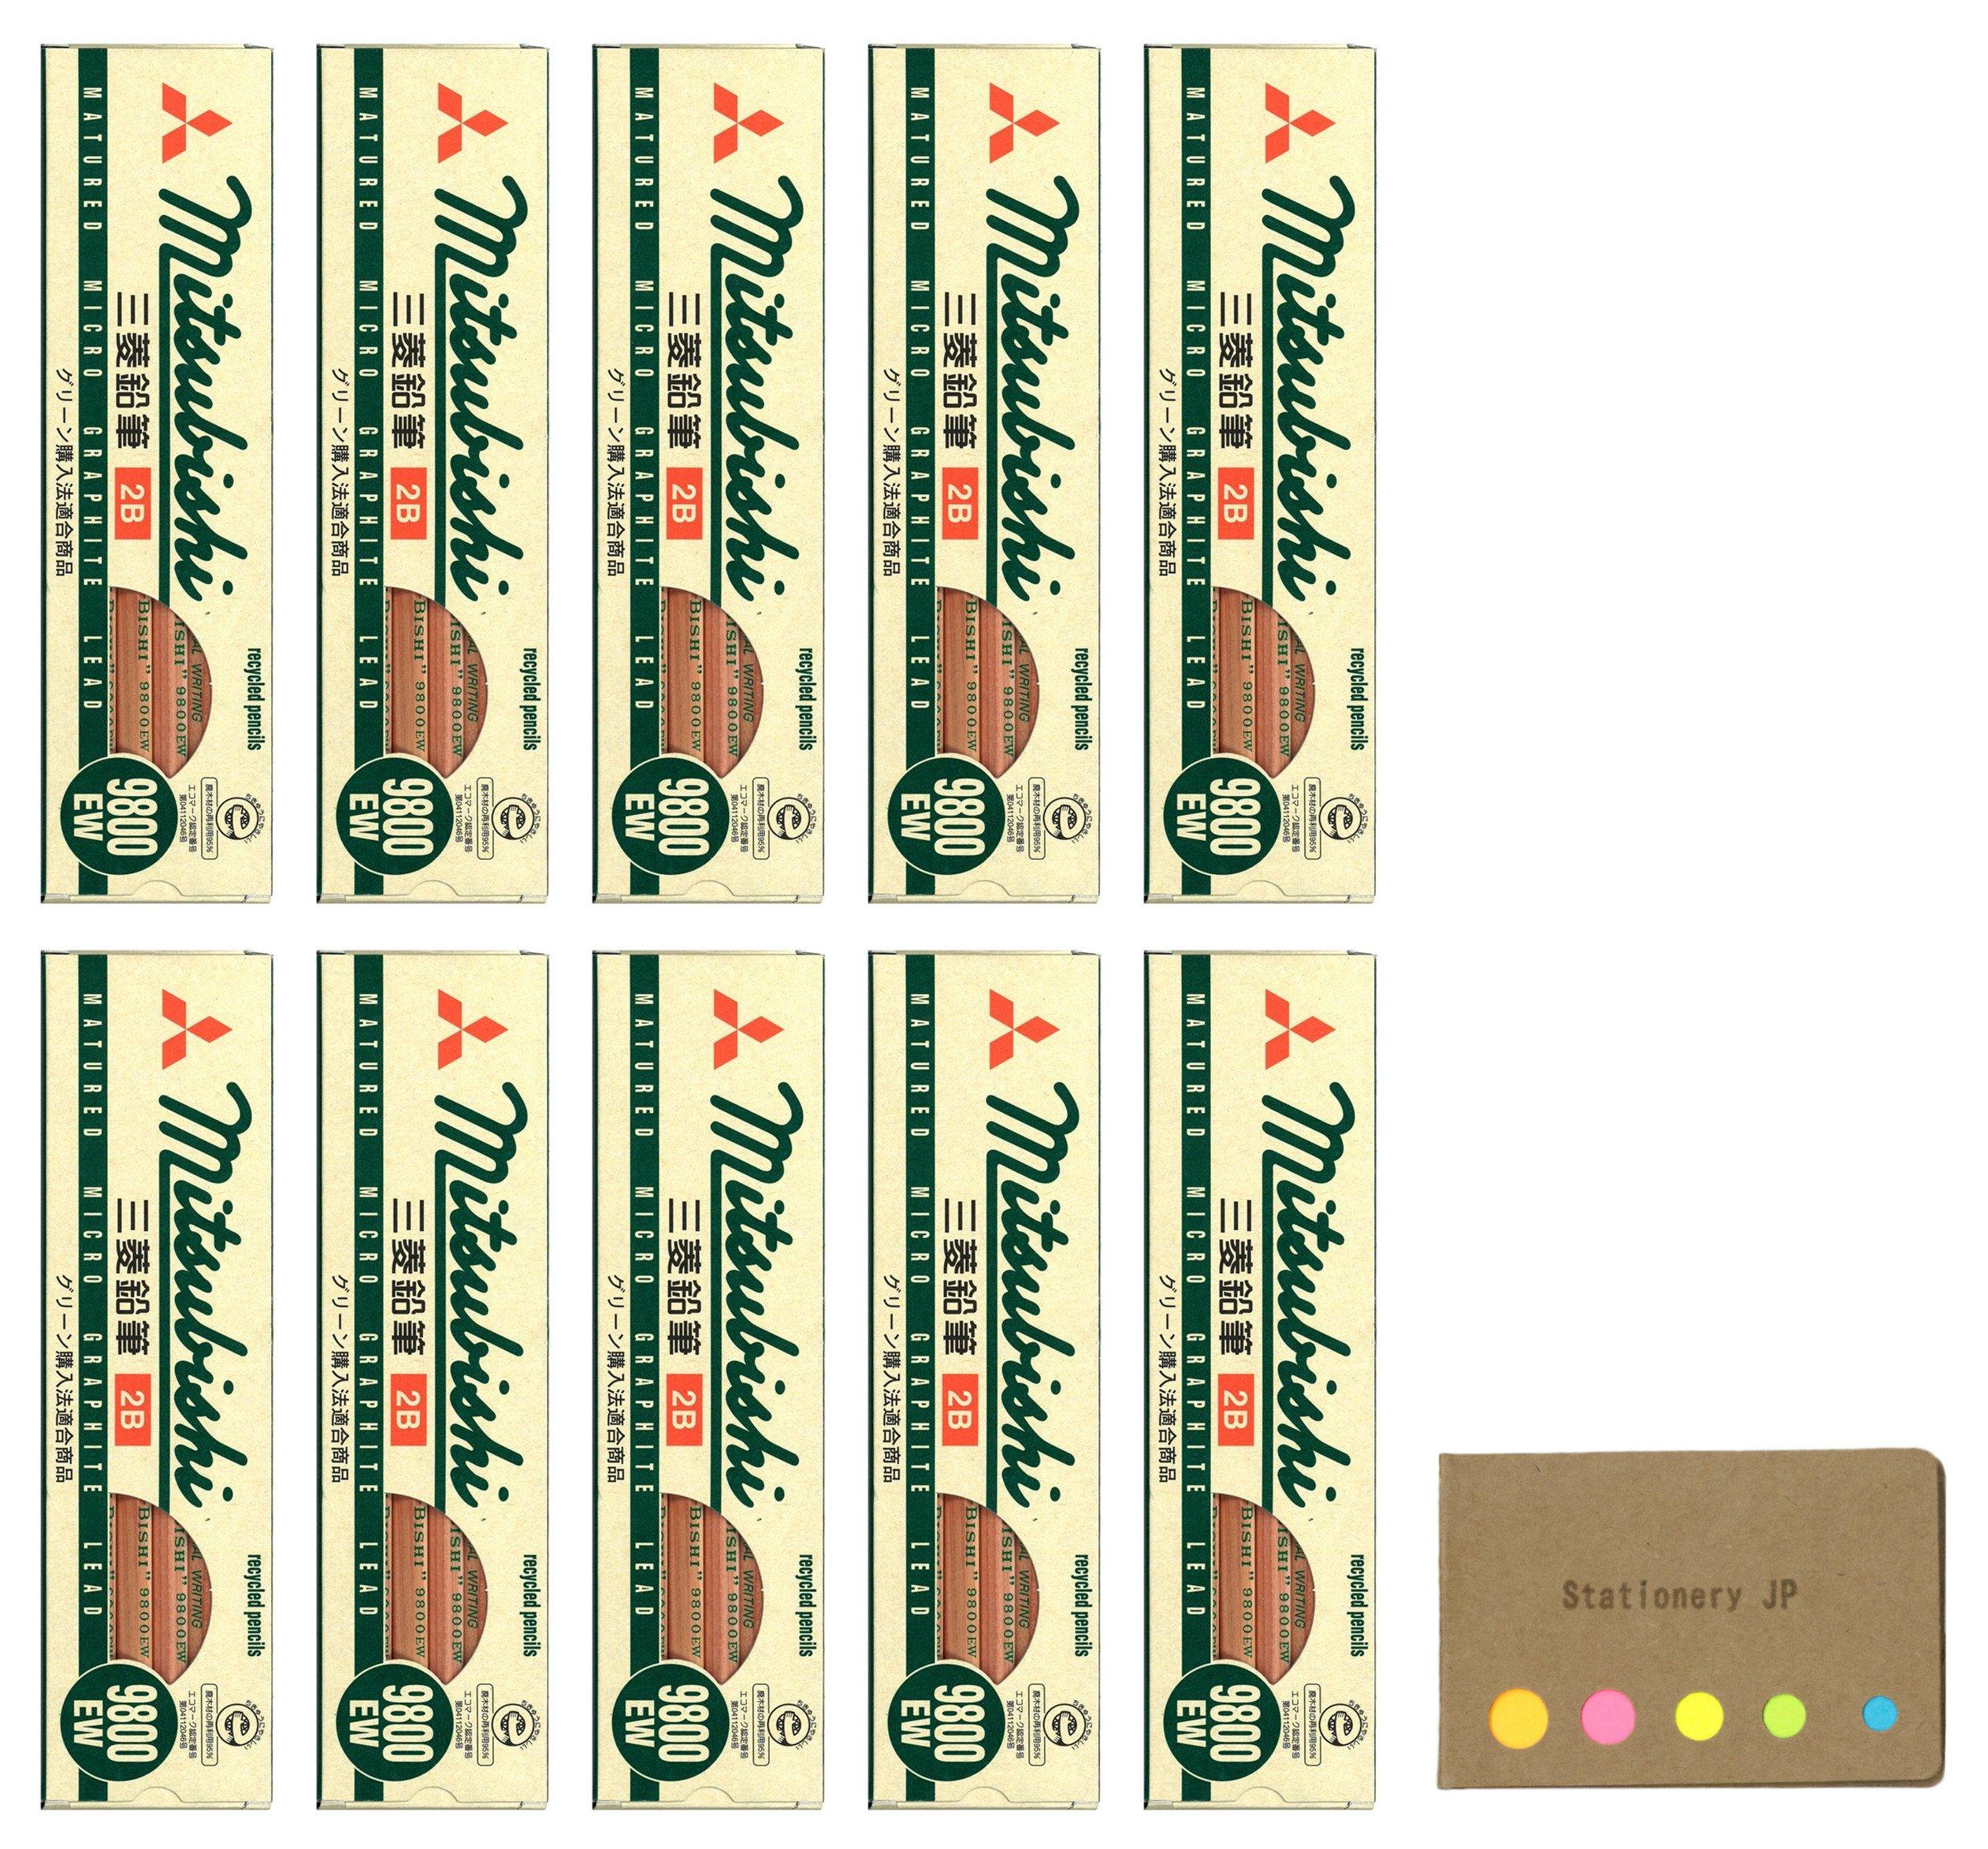 Uni Mitsubishi 9800EW Recycling Pencil, 2B, 10-pack/total 120 pcs, Sticky Notes Value Set